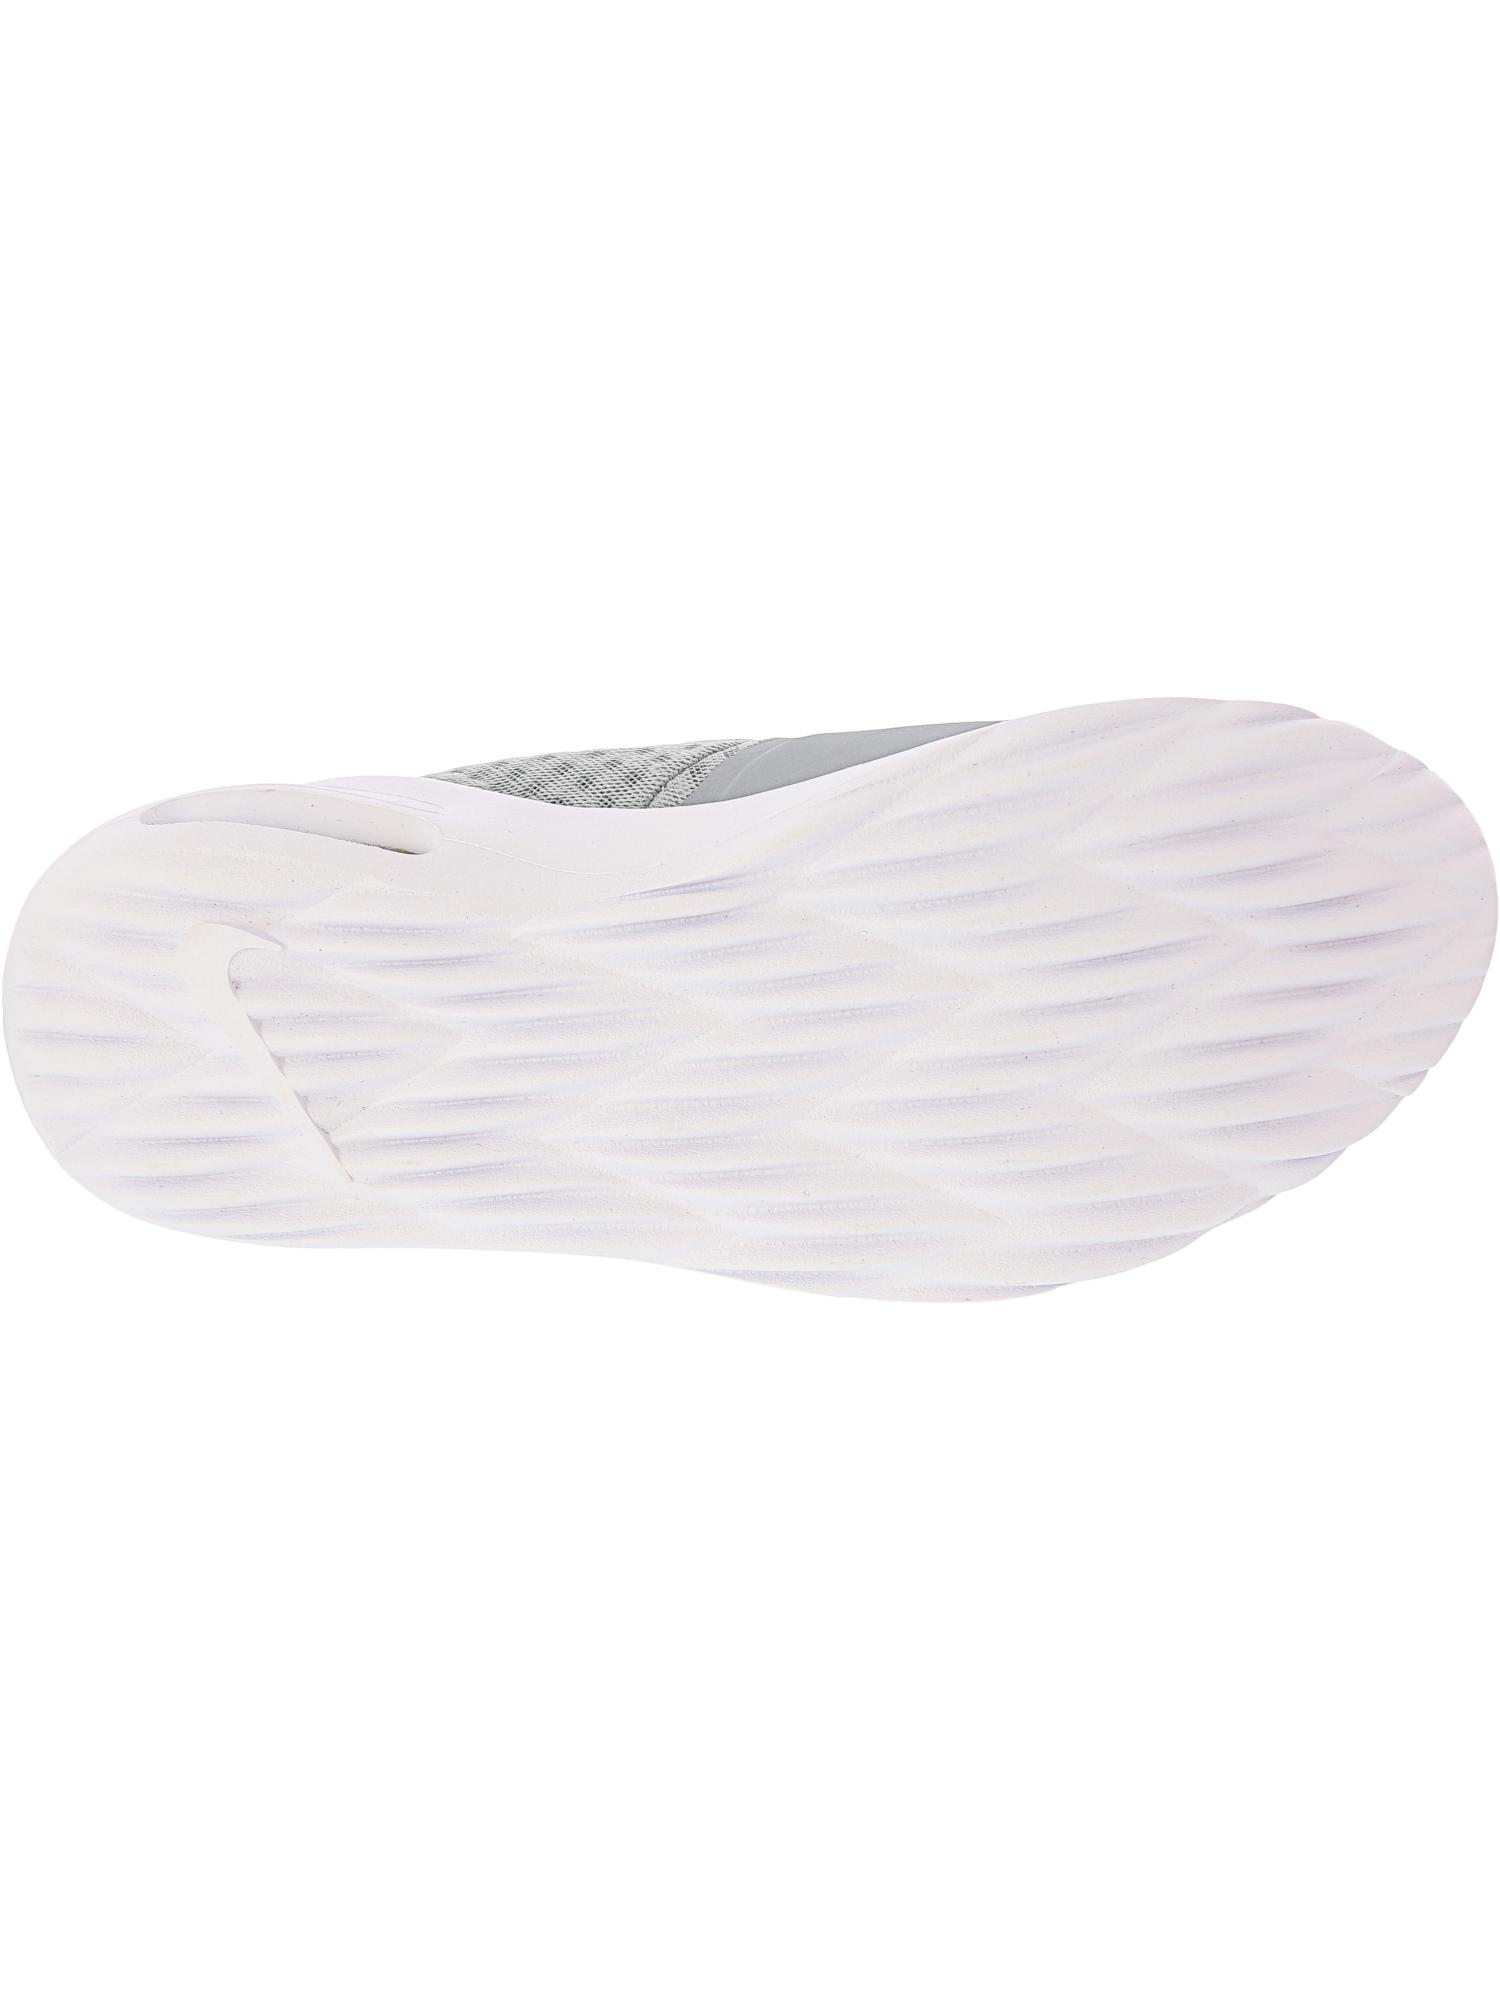 ee94cefc7dbf2 Nike Women's Air Max Sasha Ankle-High Running Shoe | eBay